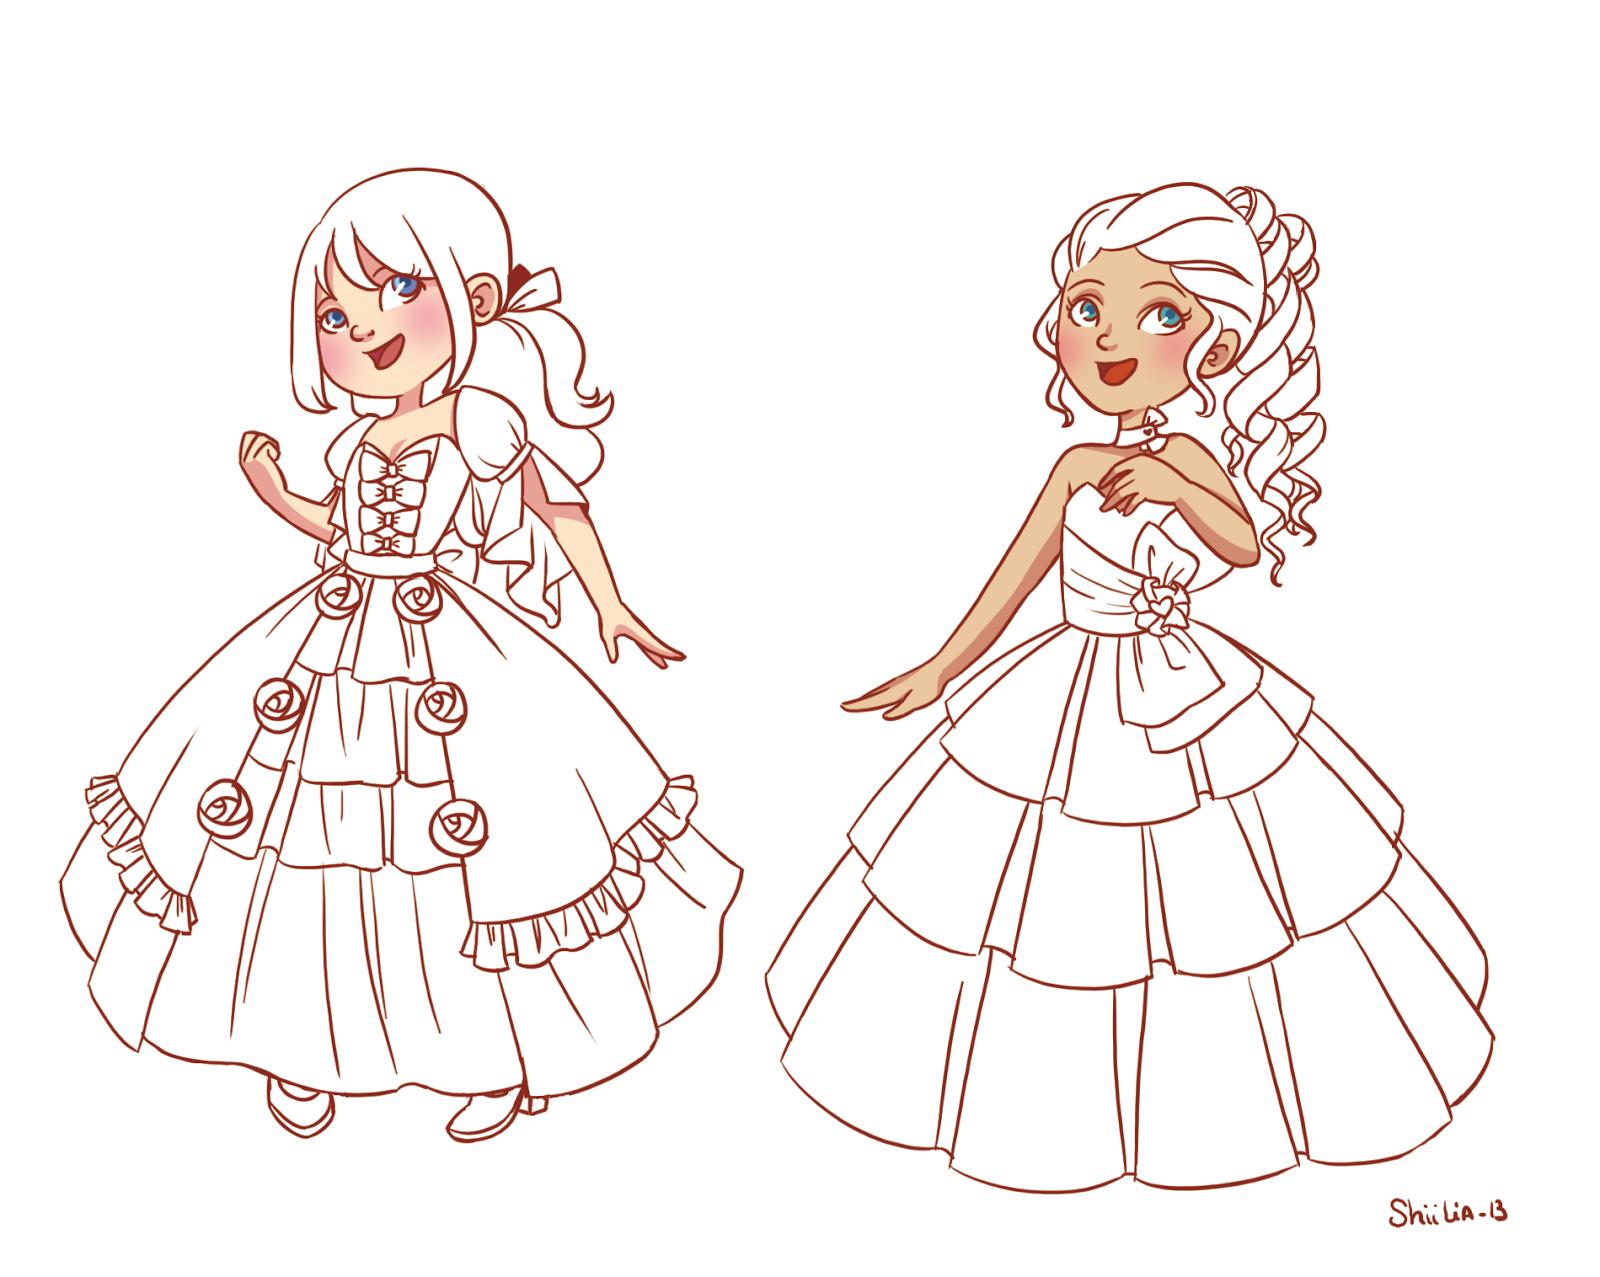 Coloriage Fille A Imprimer Princesse.Coloriage Filles A Imprimer Liberate